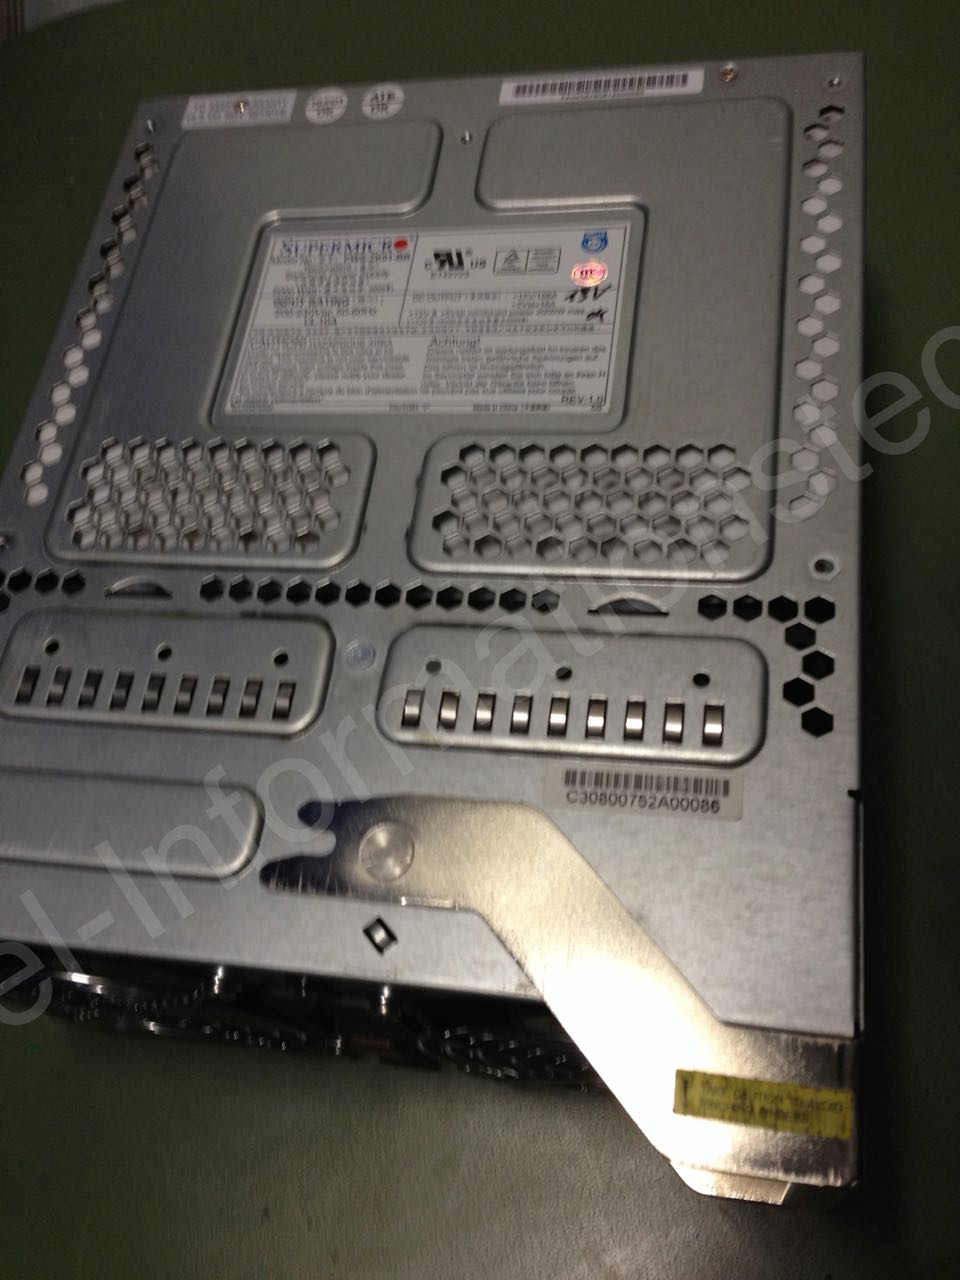 Supermicro PWS-2K01-BR